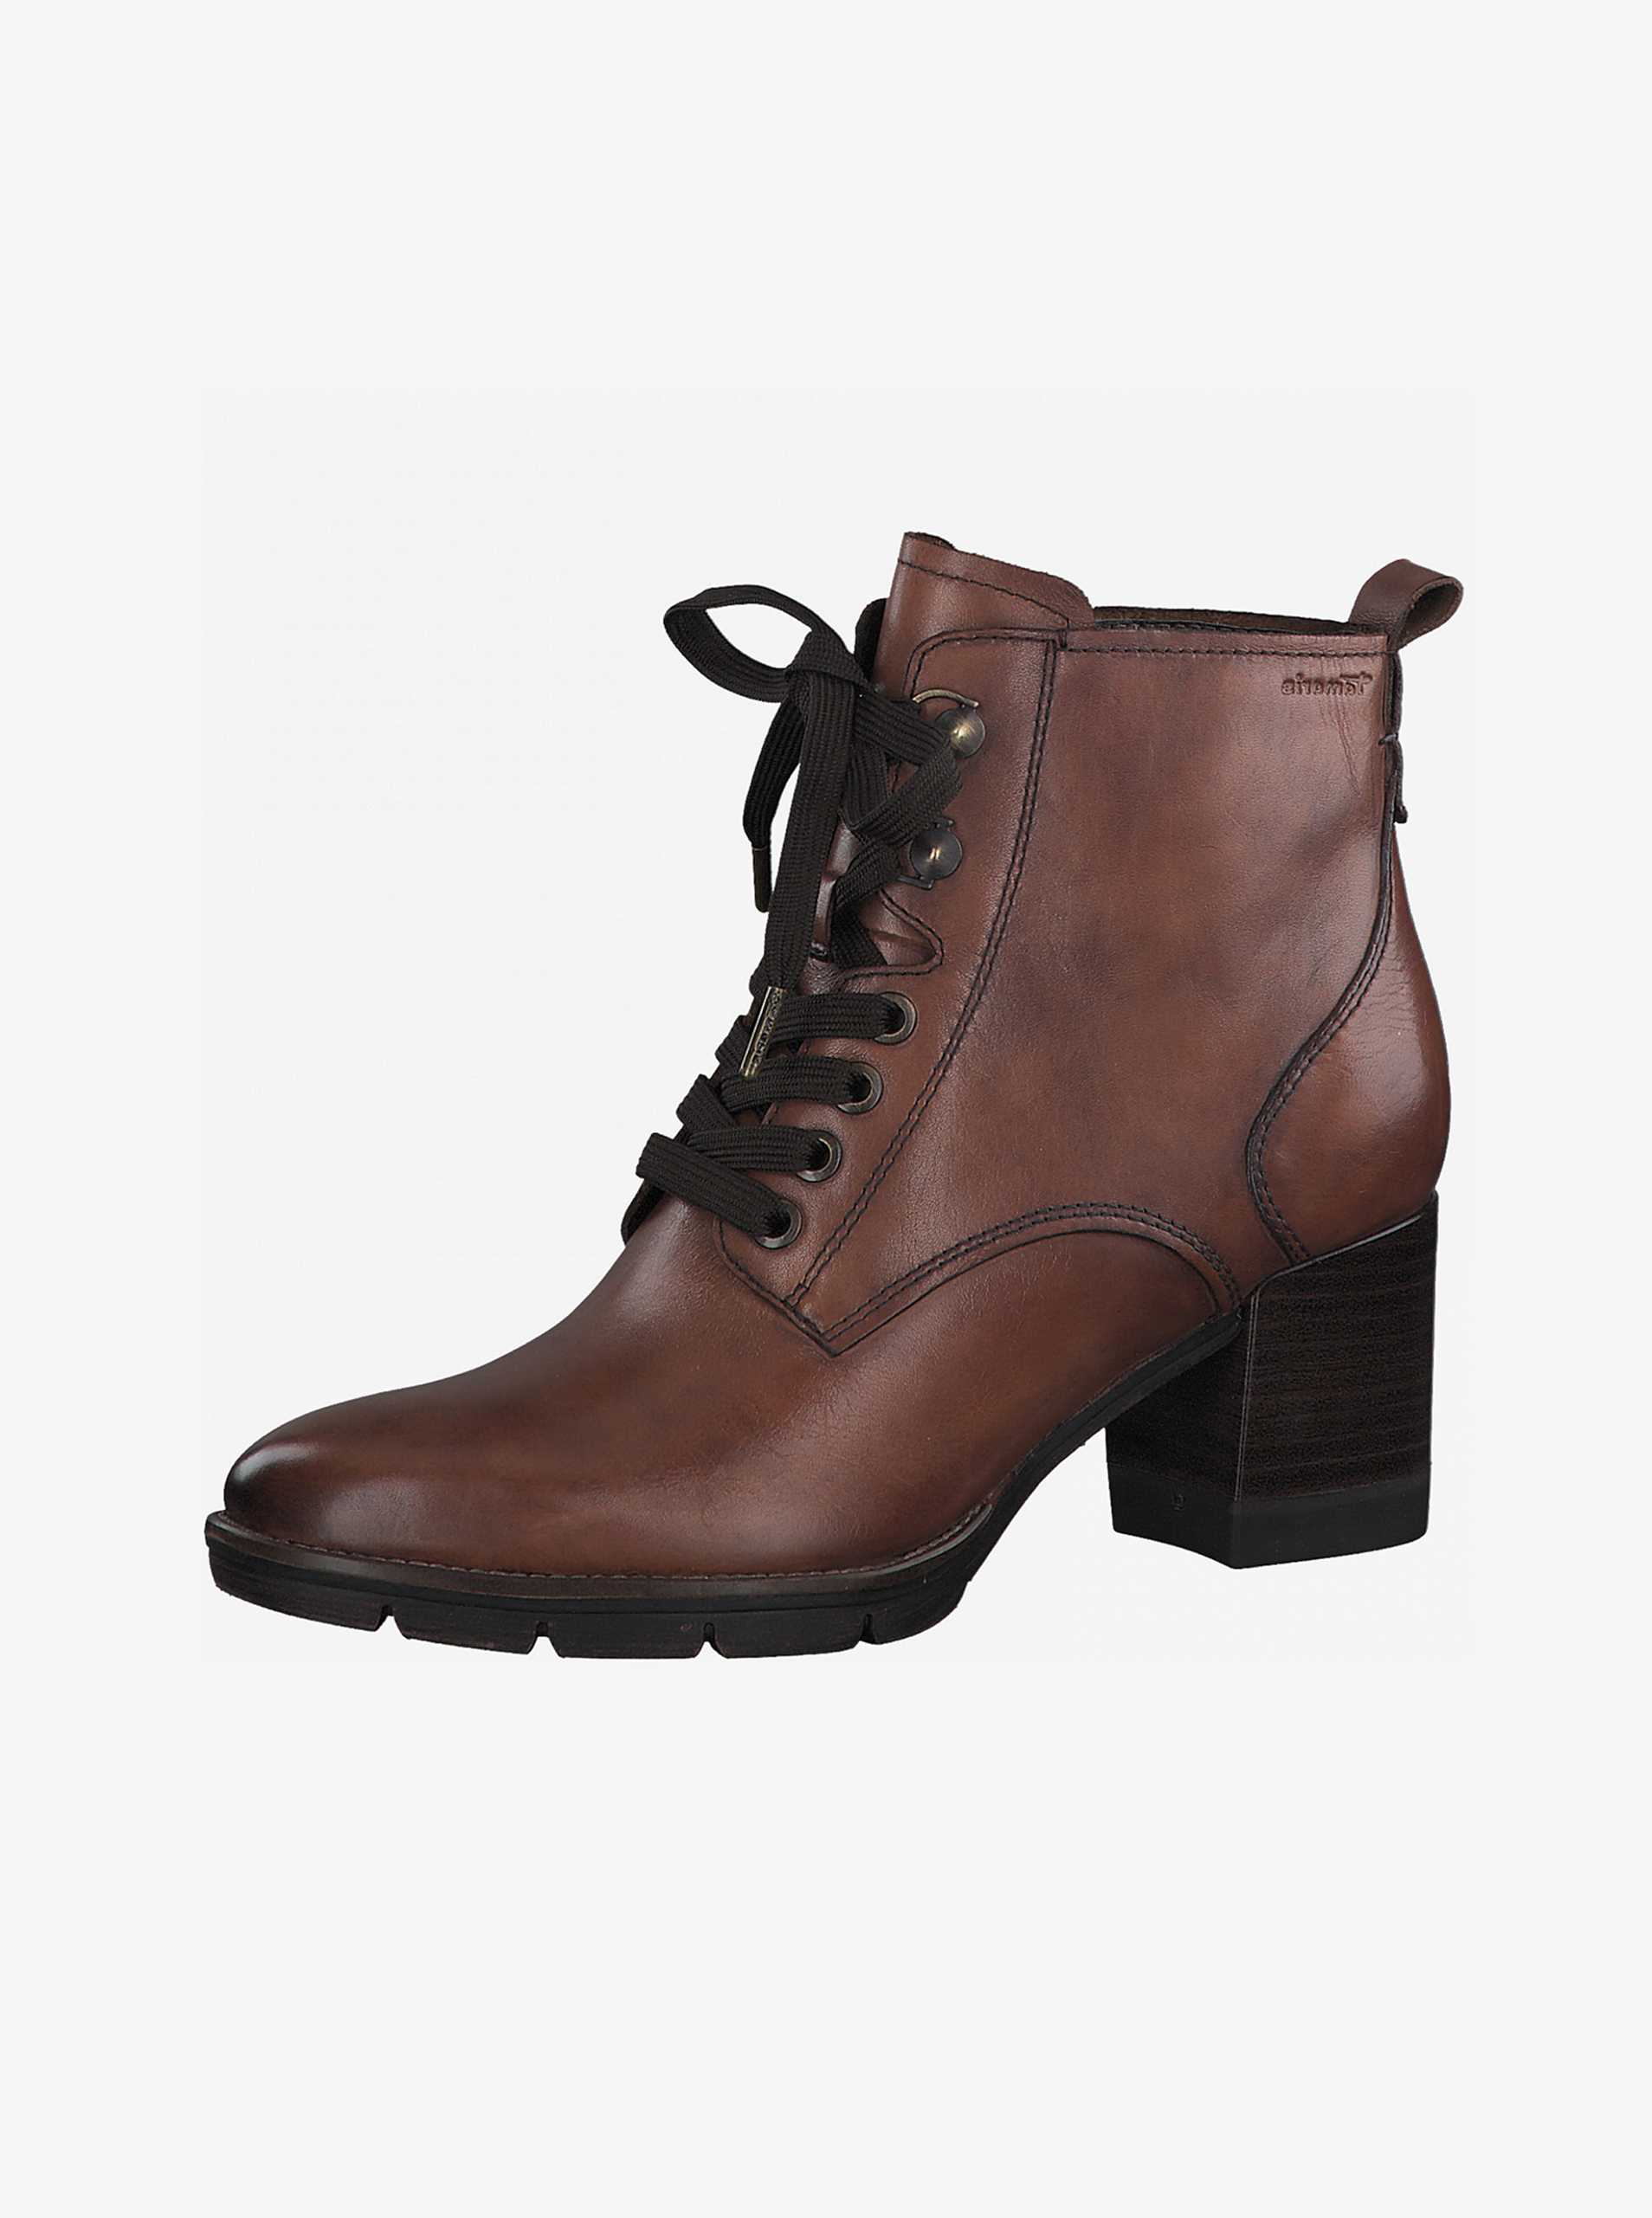 Hnedé kožené členkové topánky na podpätku Tamaris - 36